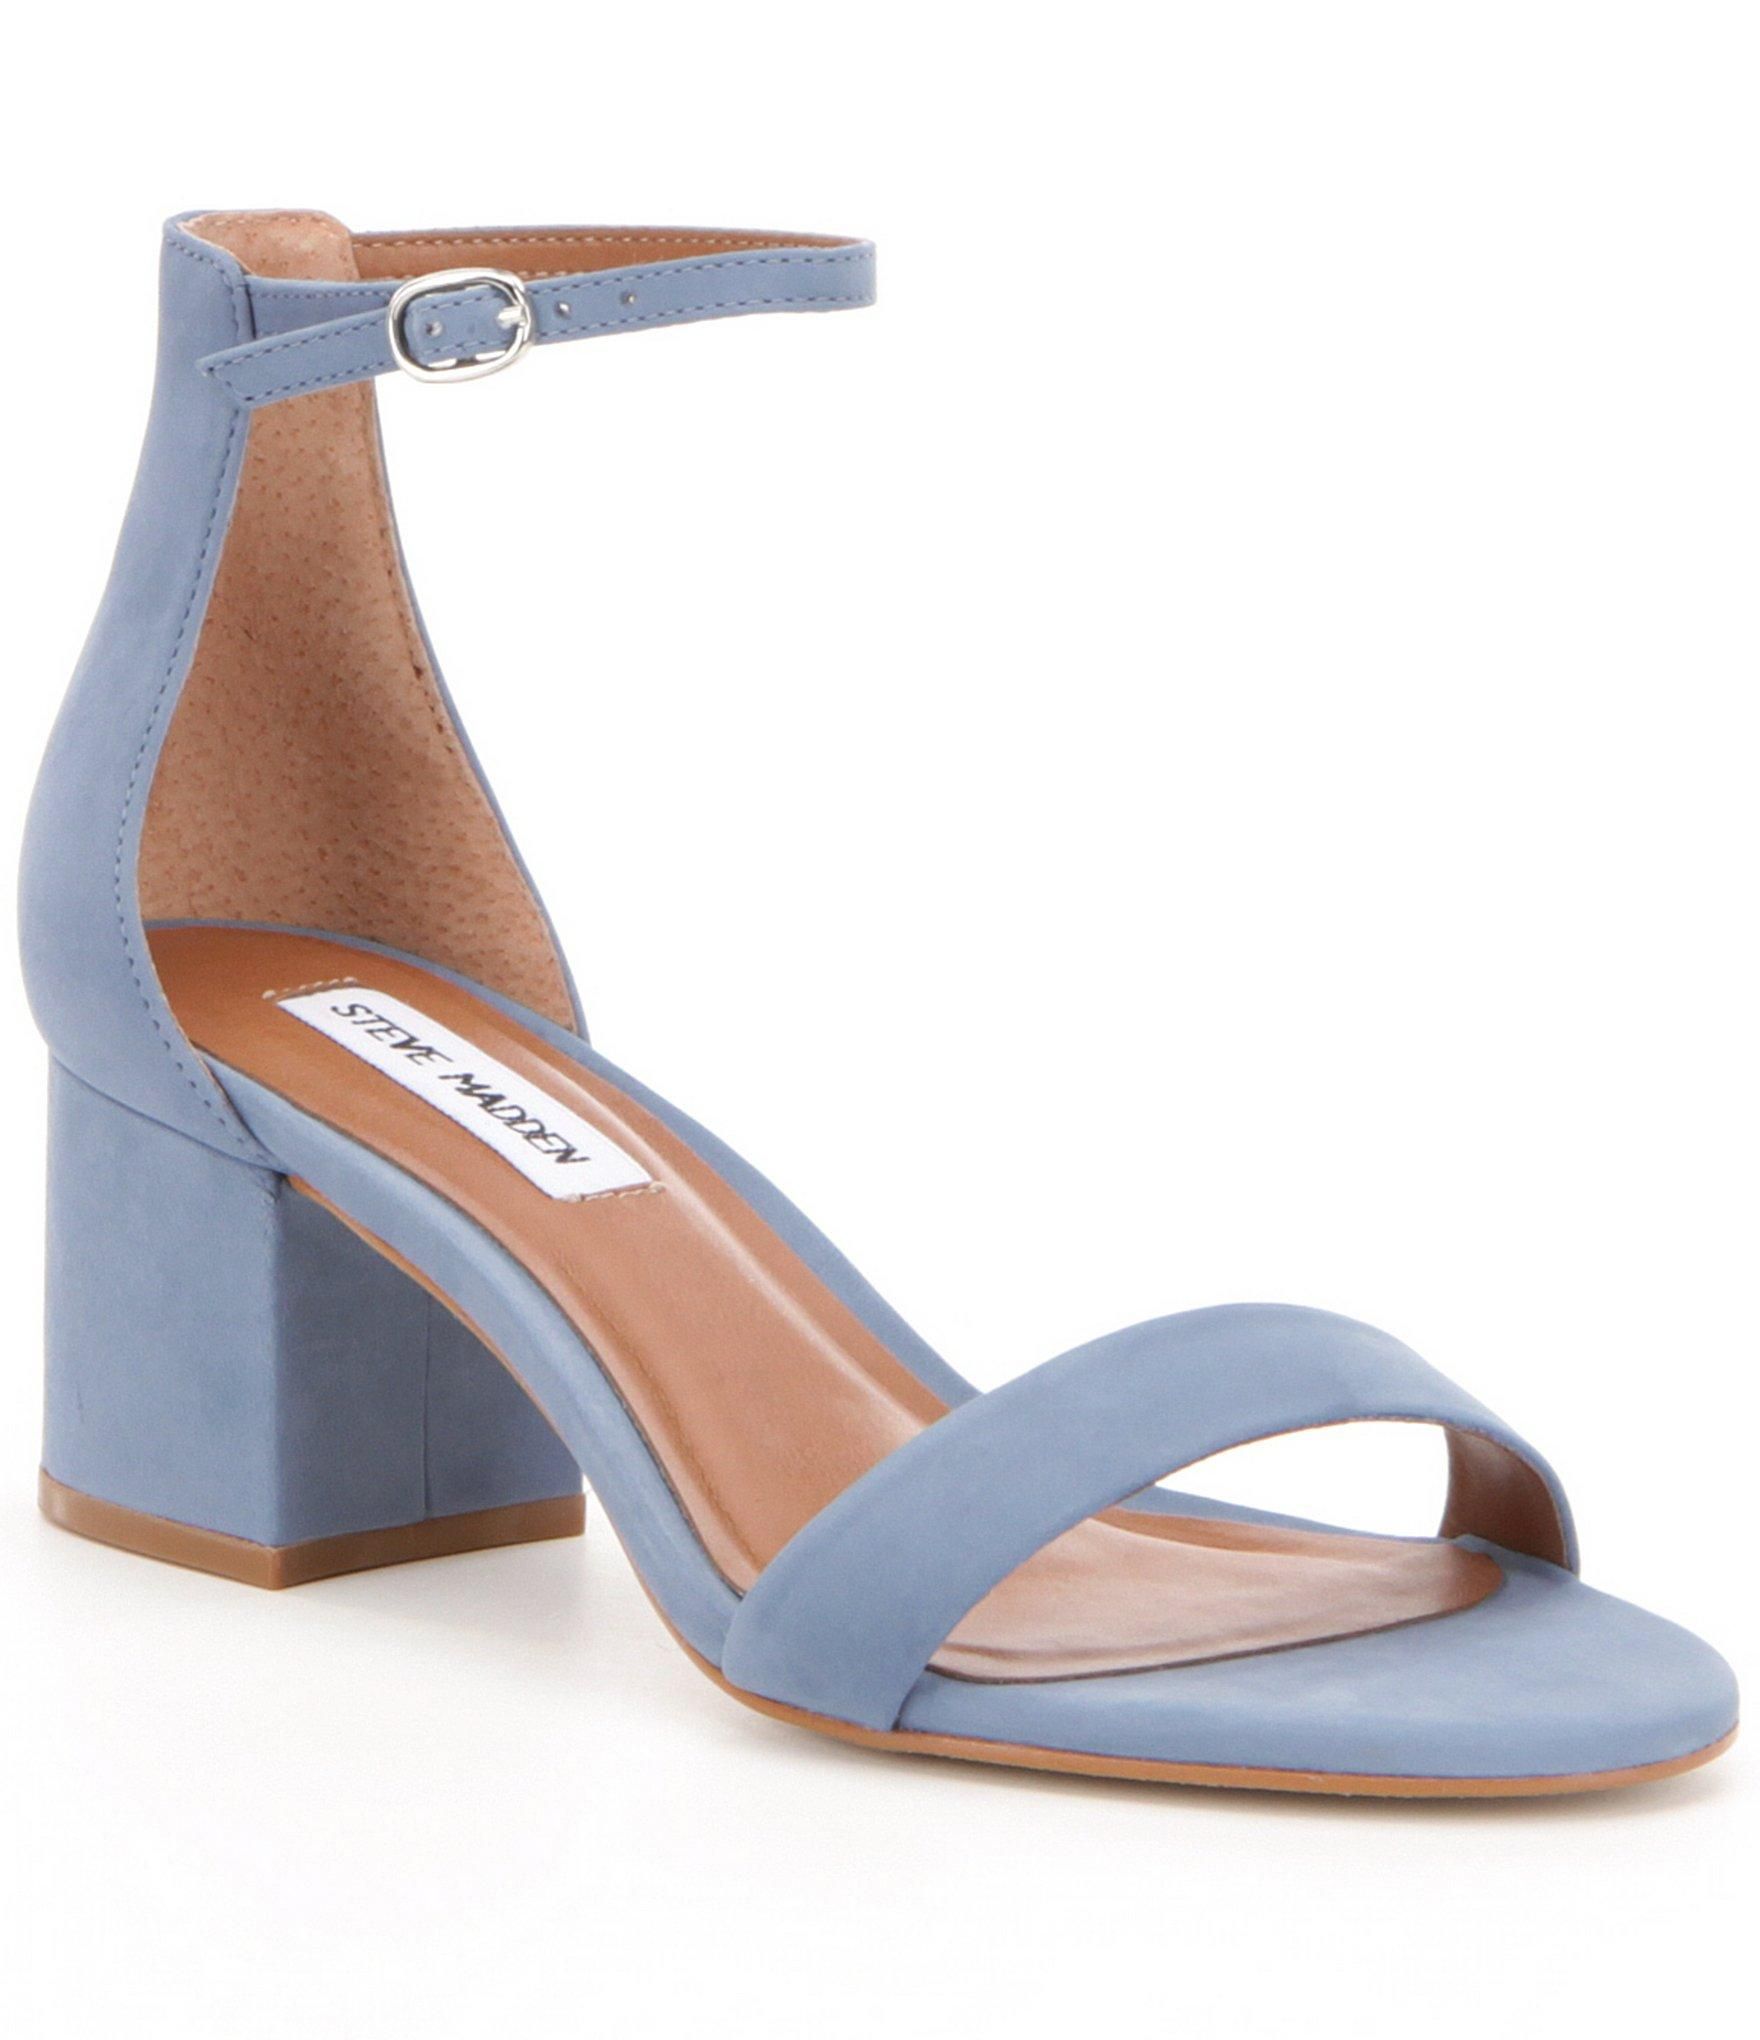 061b03e957 Steve Madden Irenee Ankle Strap Suede Block Heel Dress Sandals in ...